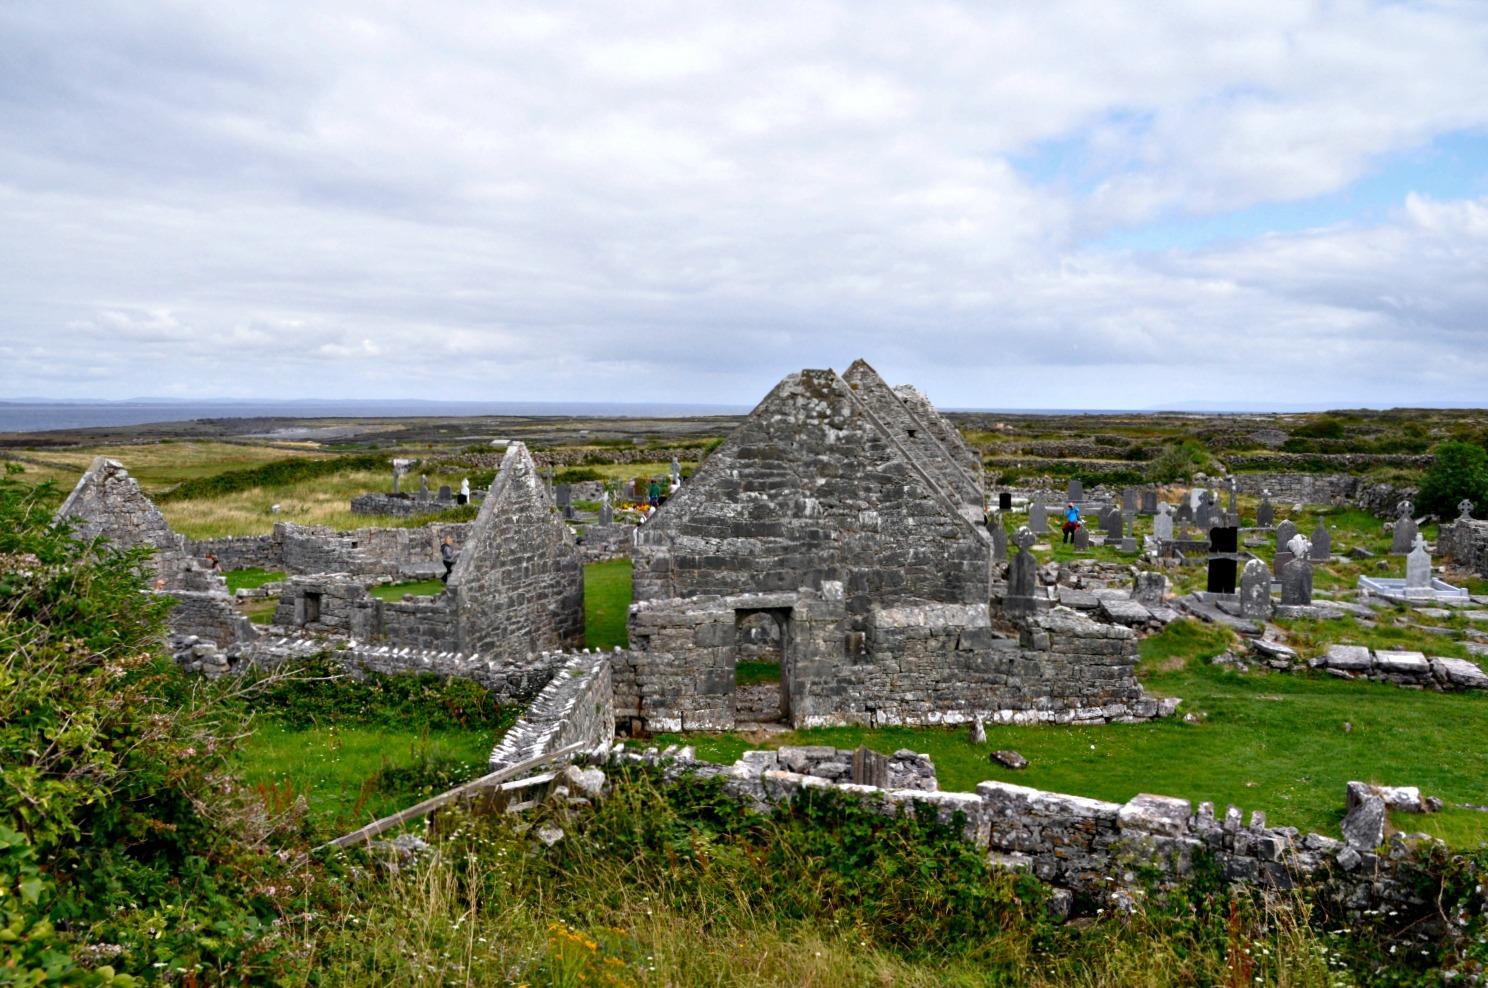 The monastery of Enda on the small island of Inis Mor. Photo: Meg Pier